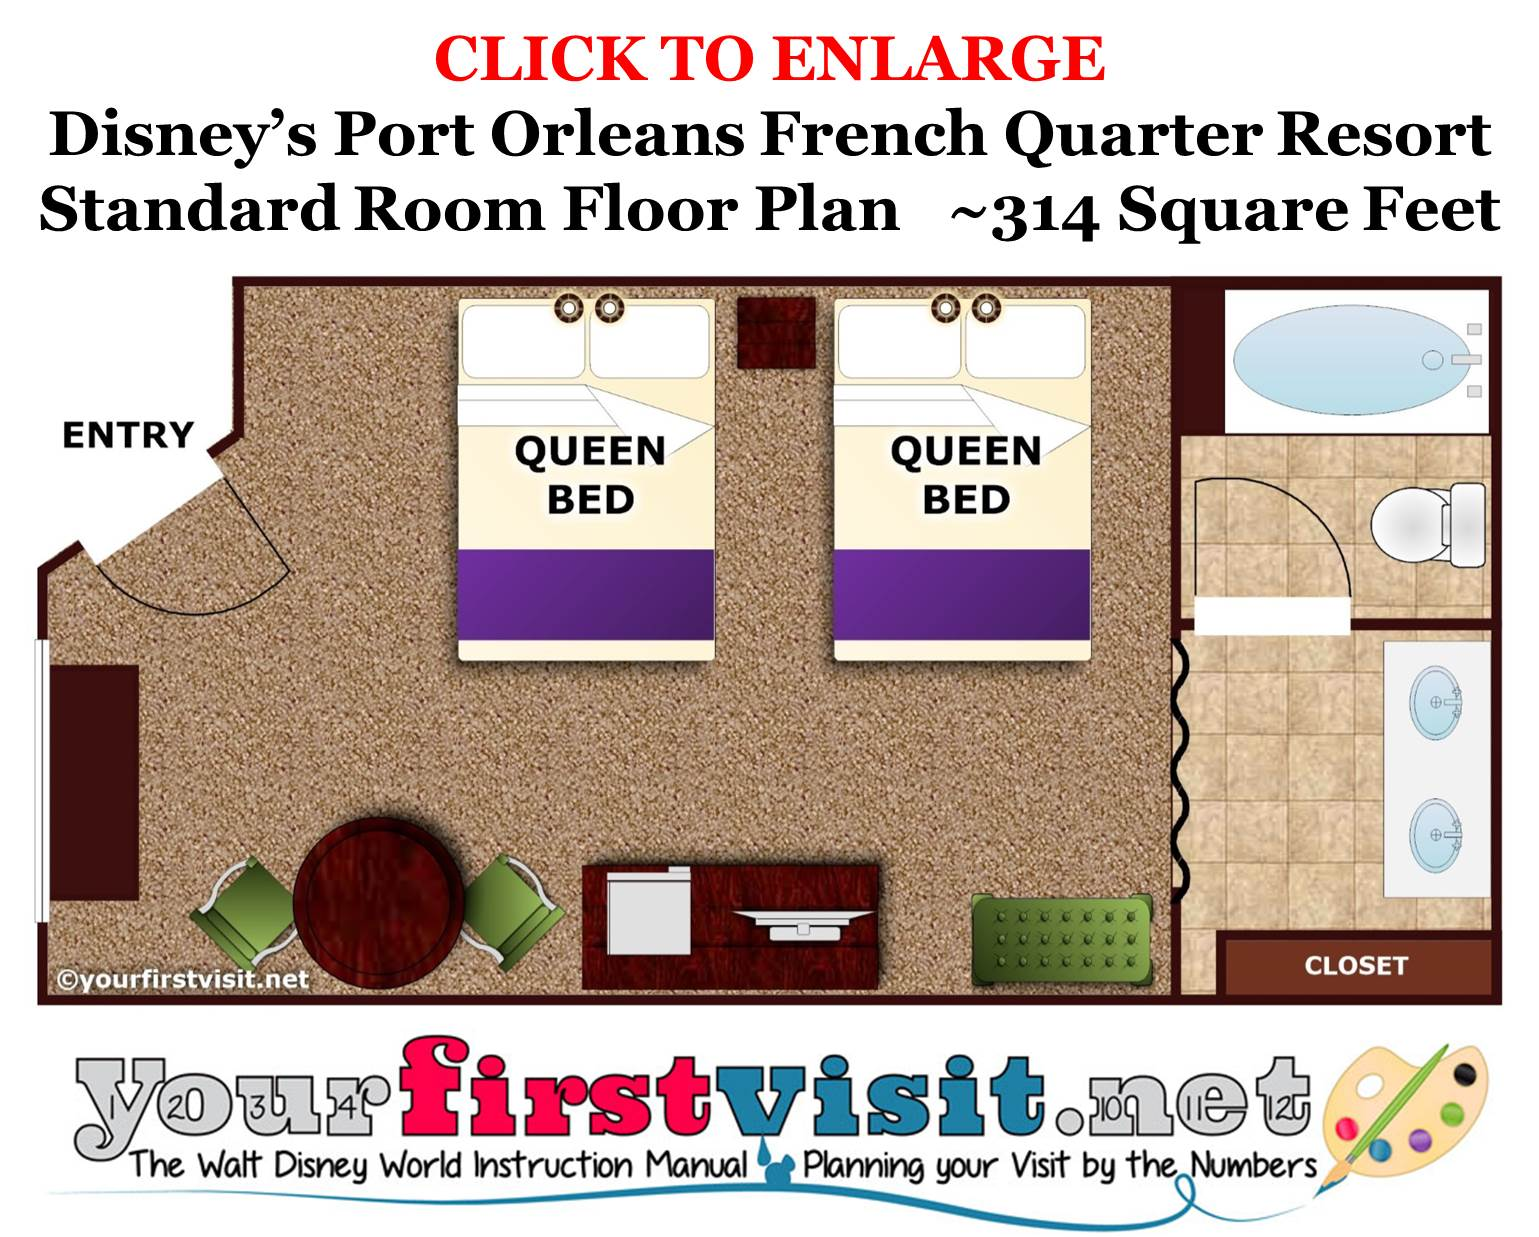 floor-plan-standard-room-disneys-port-orleans-french-quarter-resort-from-yourfirstvisit-net